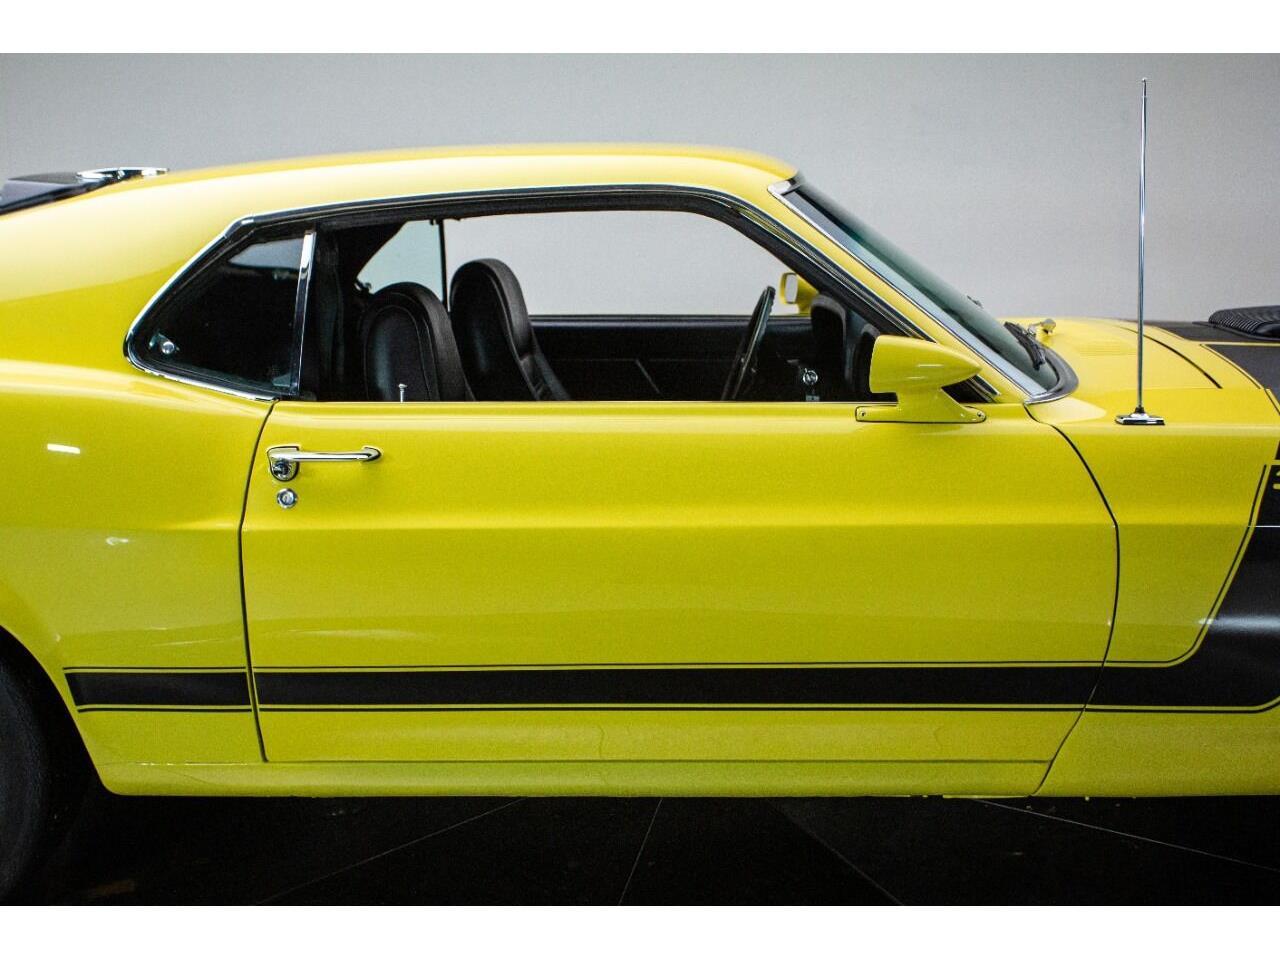 1970 Ford Mustang Boss 302 (CC-1353644) for sale in Cedar Rapids, Iowa